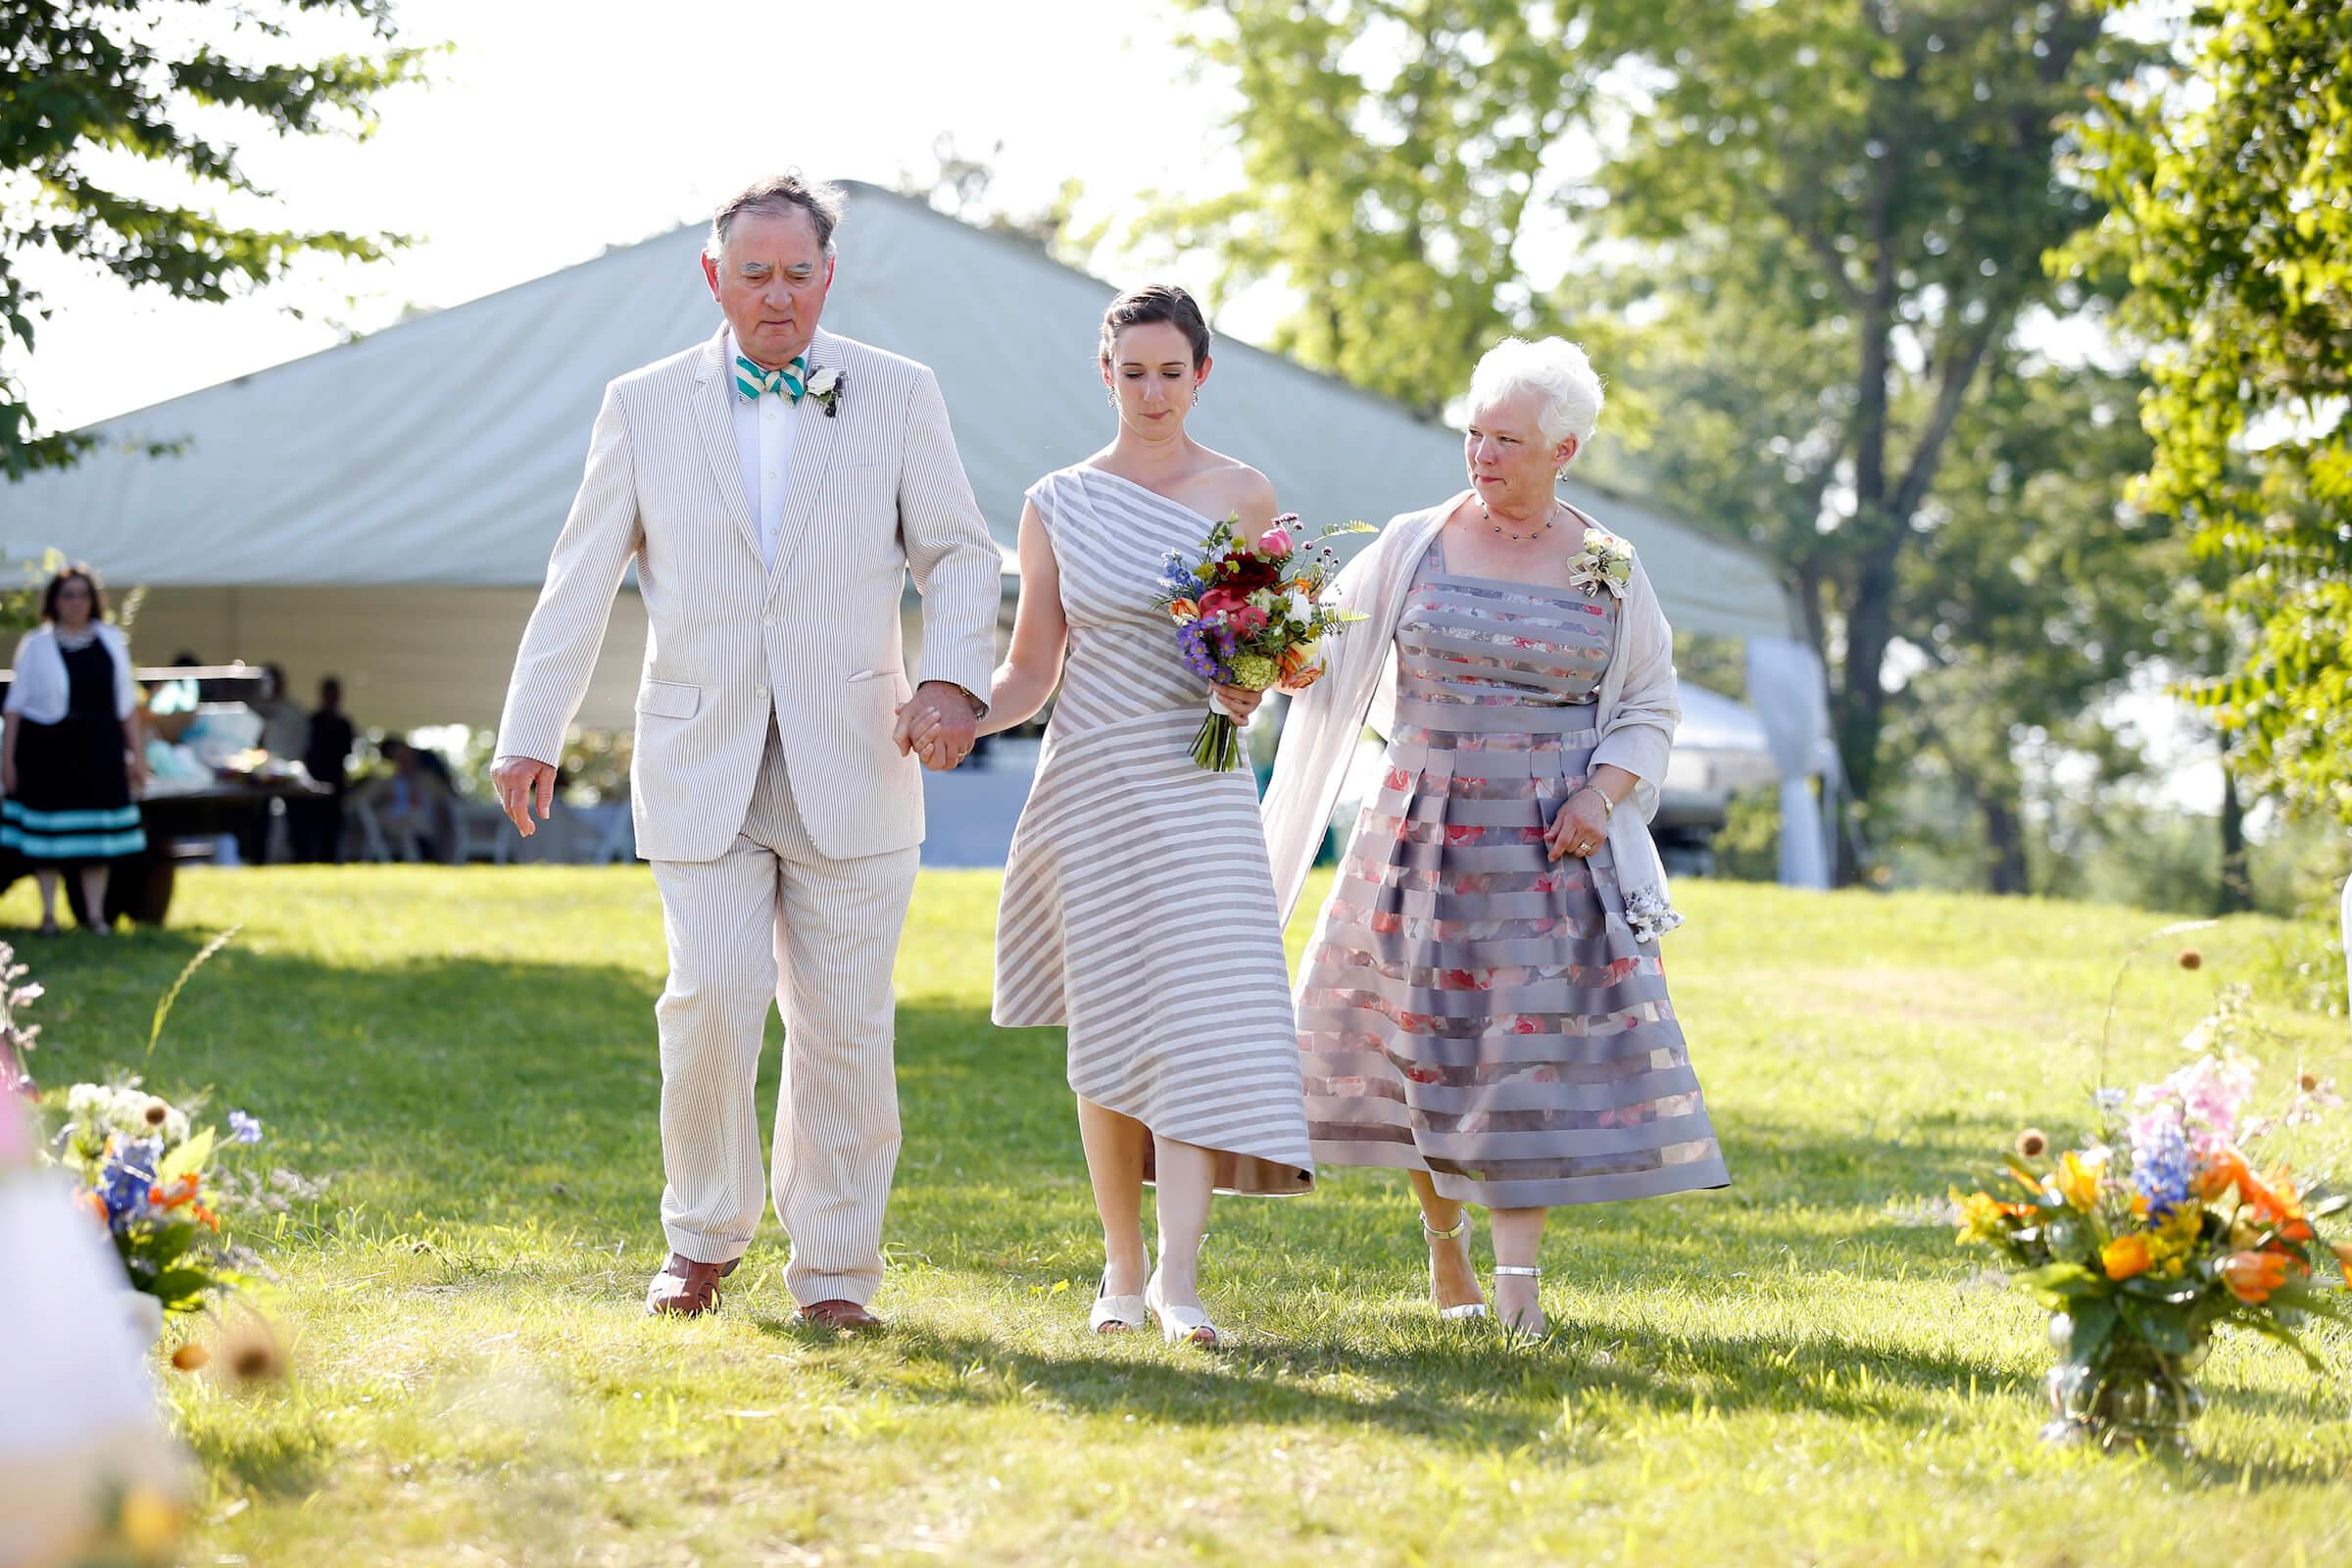 Sally's custom wedding dress by Brooks Ann Camper Bridal Couture